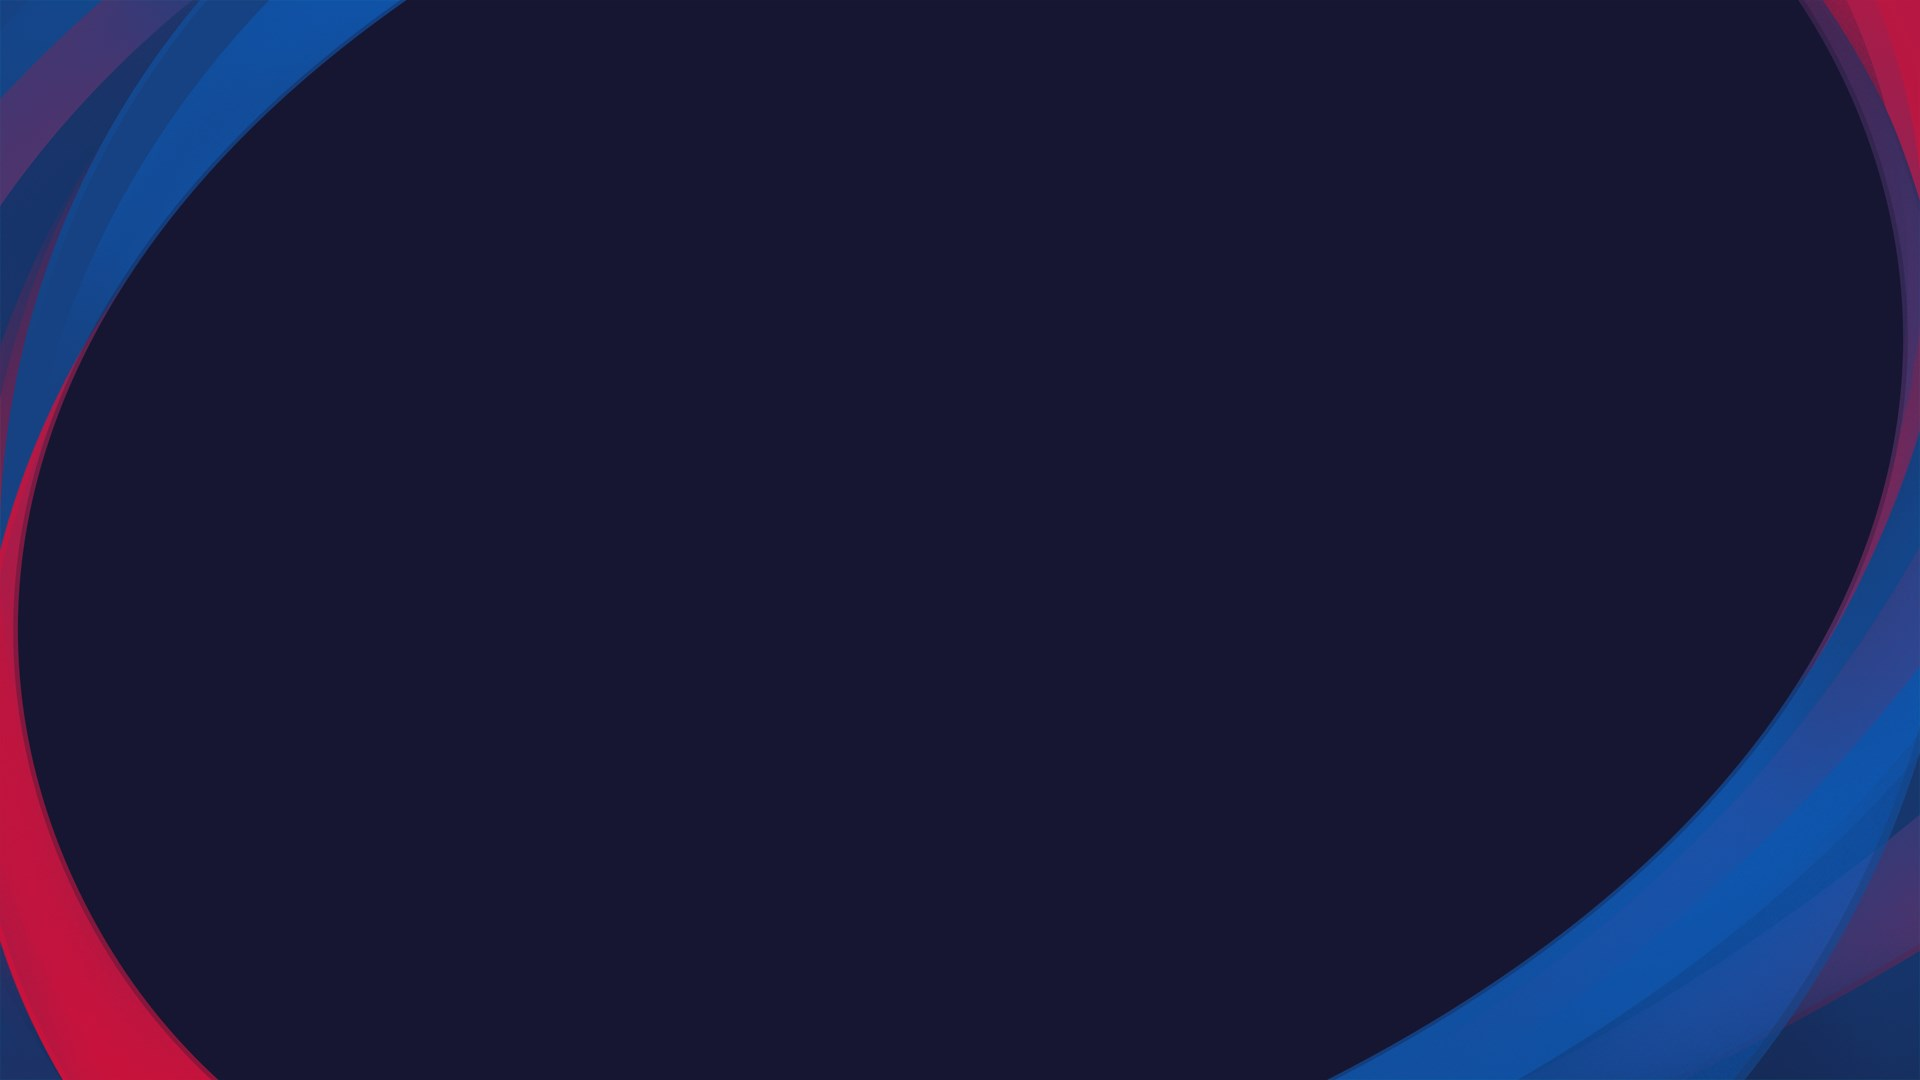 Pre-Order: eFootball PES 2021 SEASON UPDATE FC BARCELONA EDITION